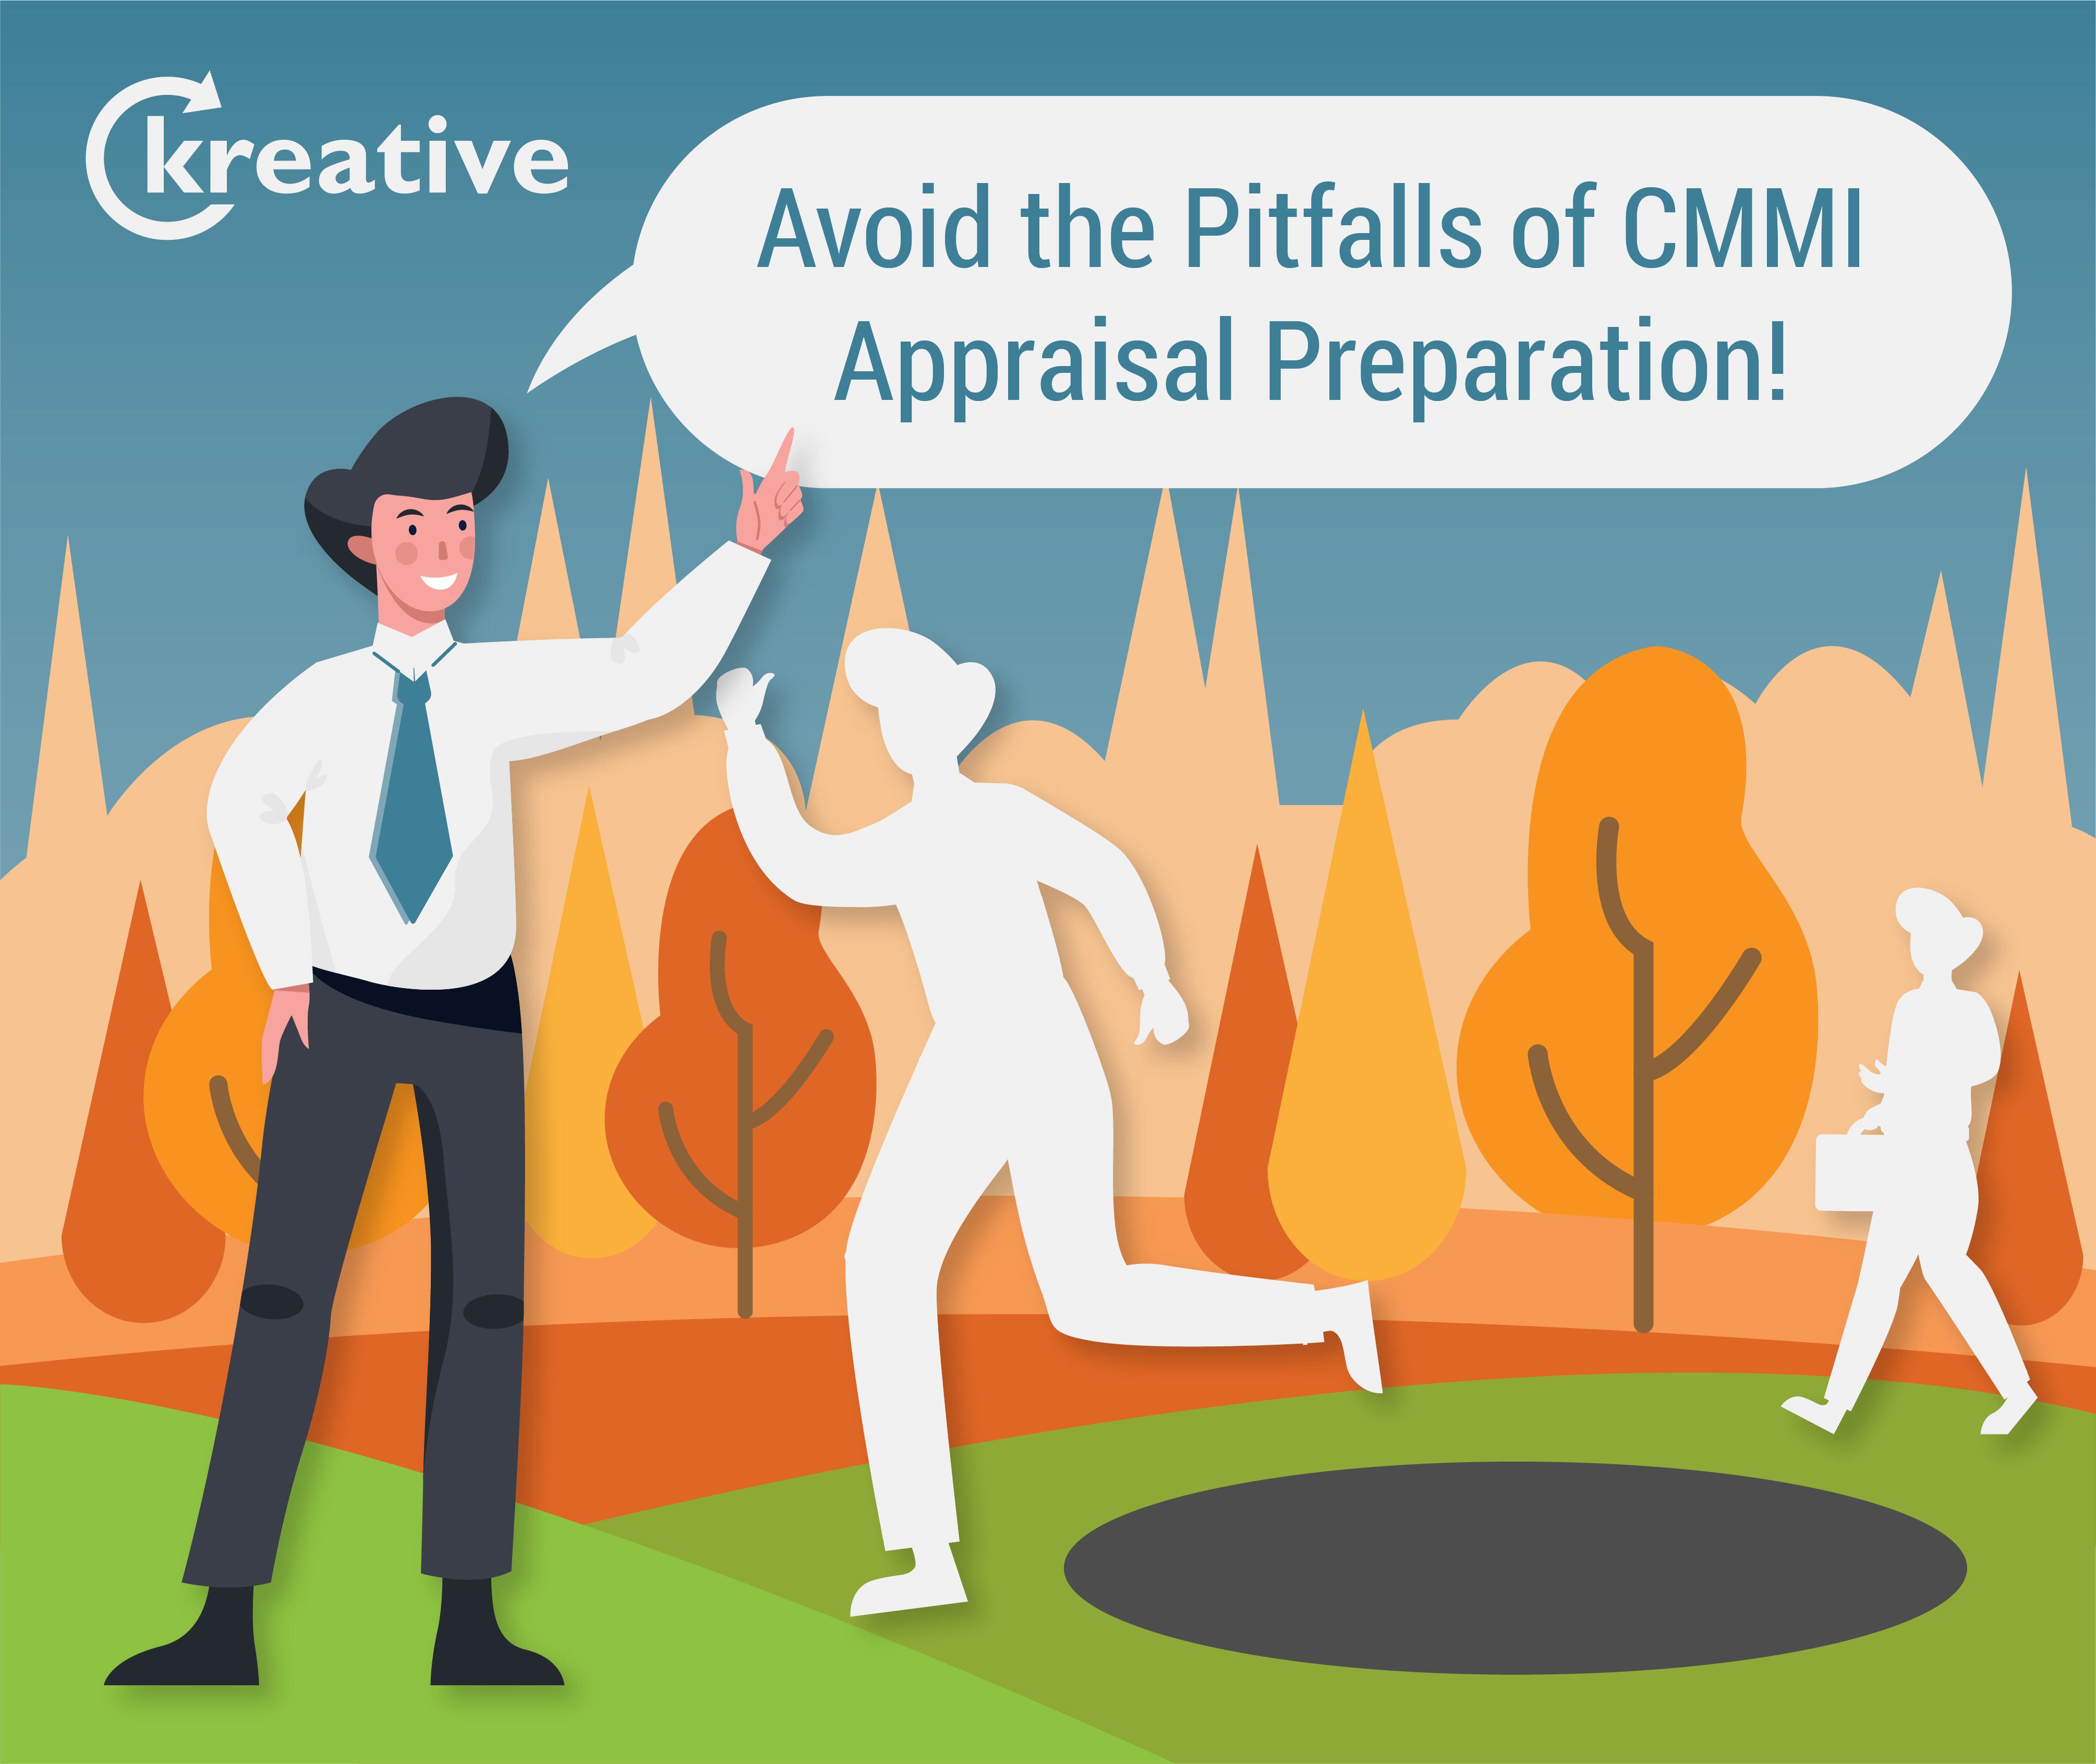 Avoiding the Pitfalls of CMMI Appraisal Preparation